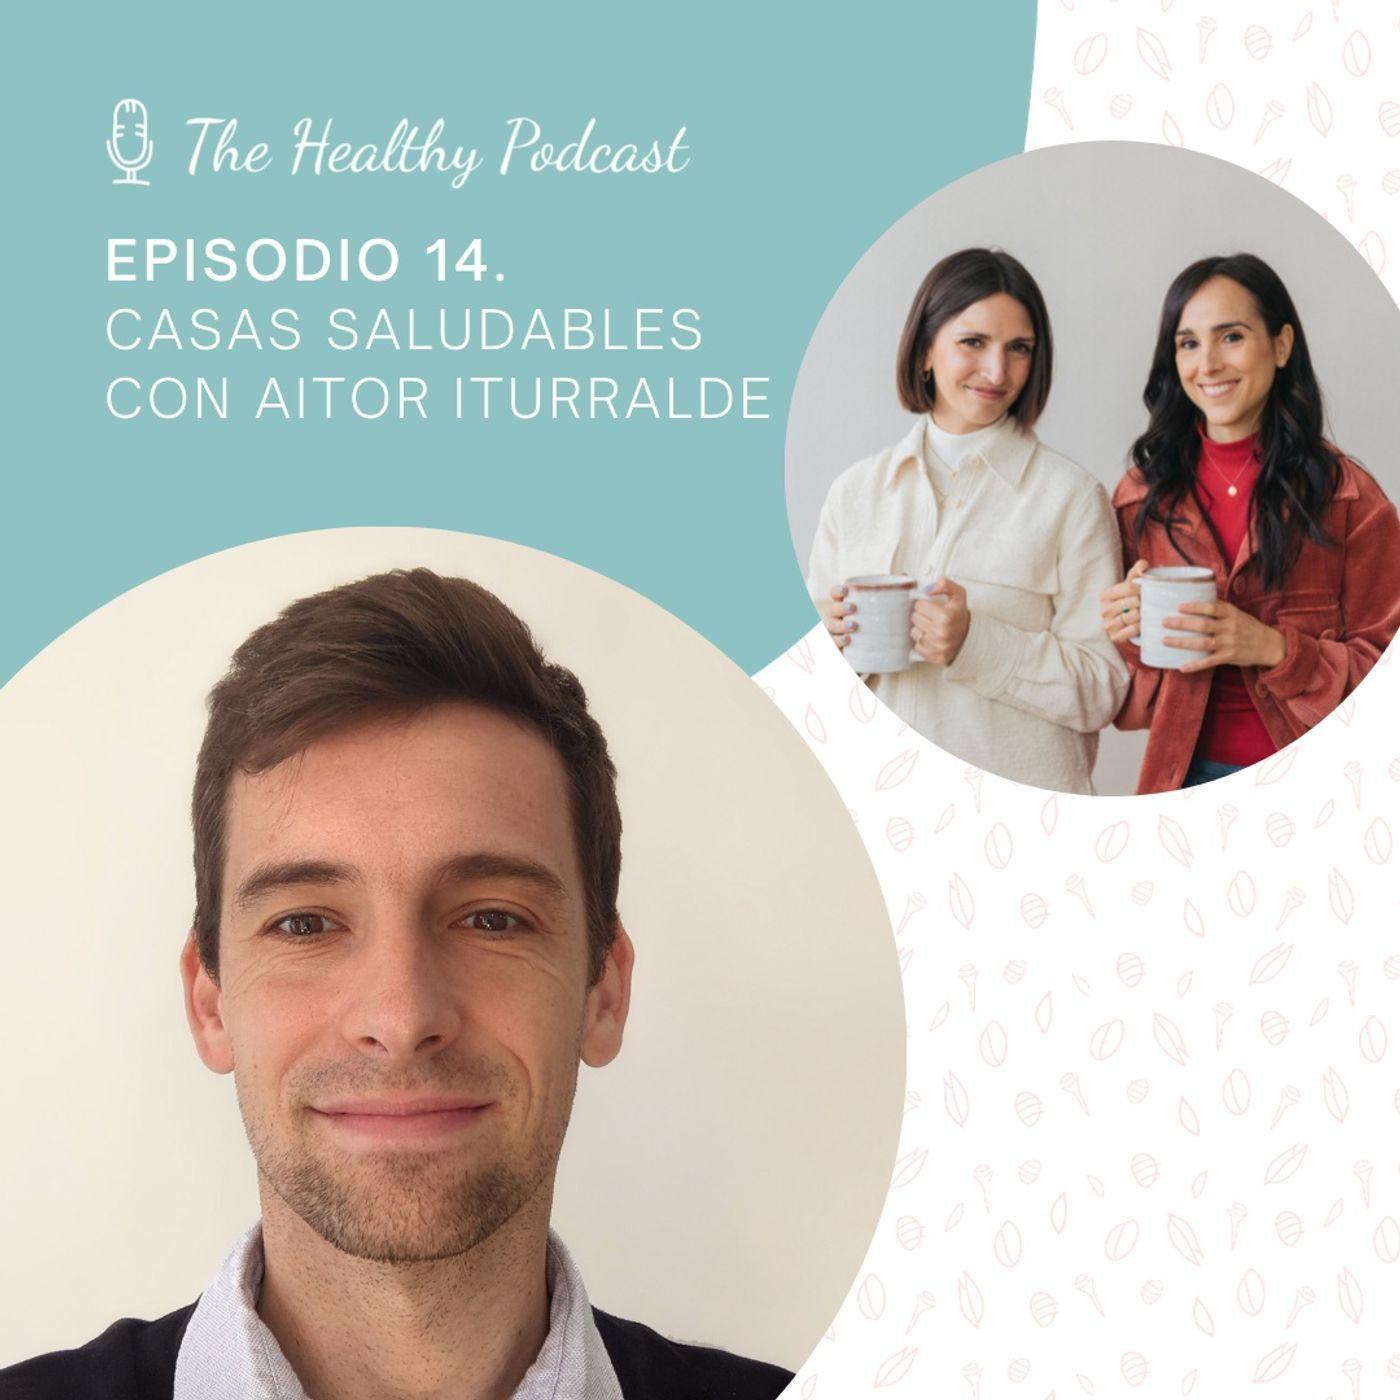 Episodio 14. Casas saludables con Aitor Iturralde